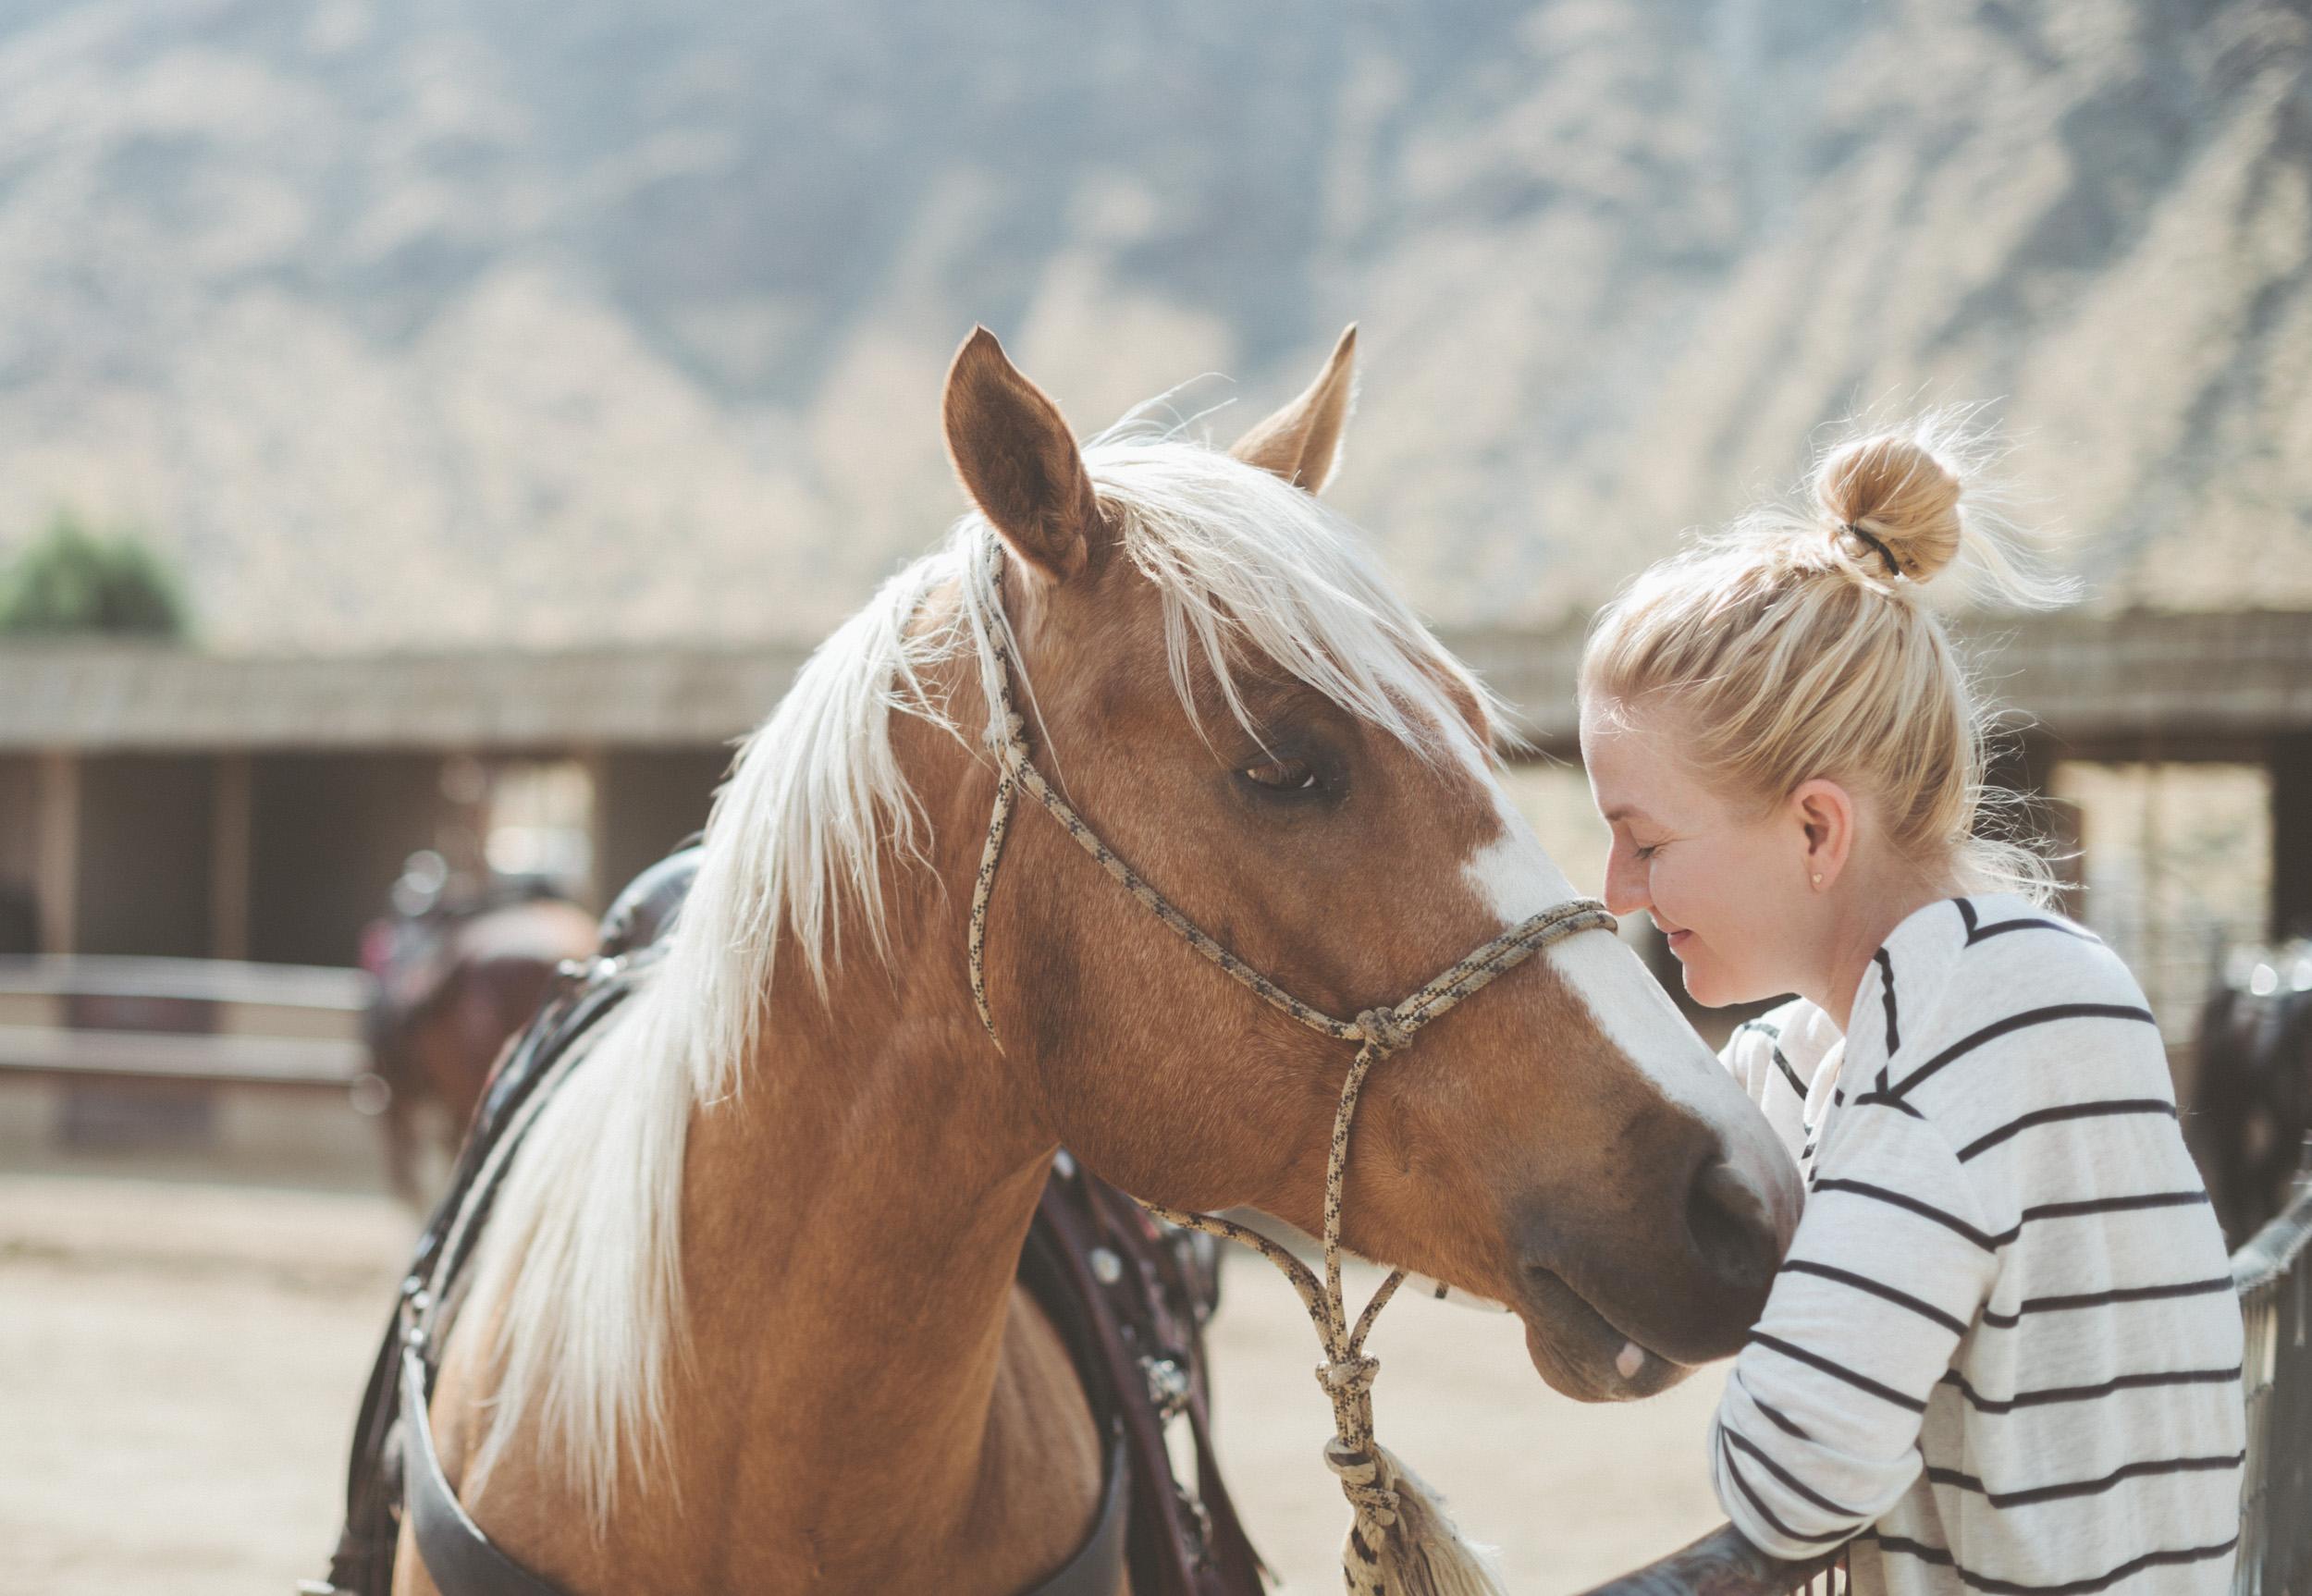 Anne Sage nuzzles a horse.